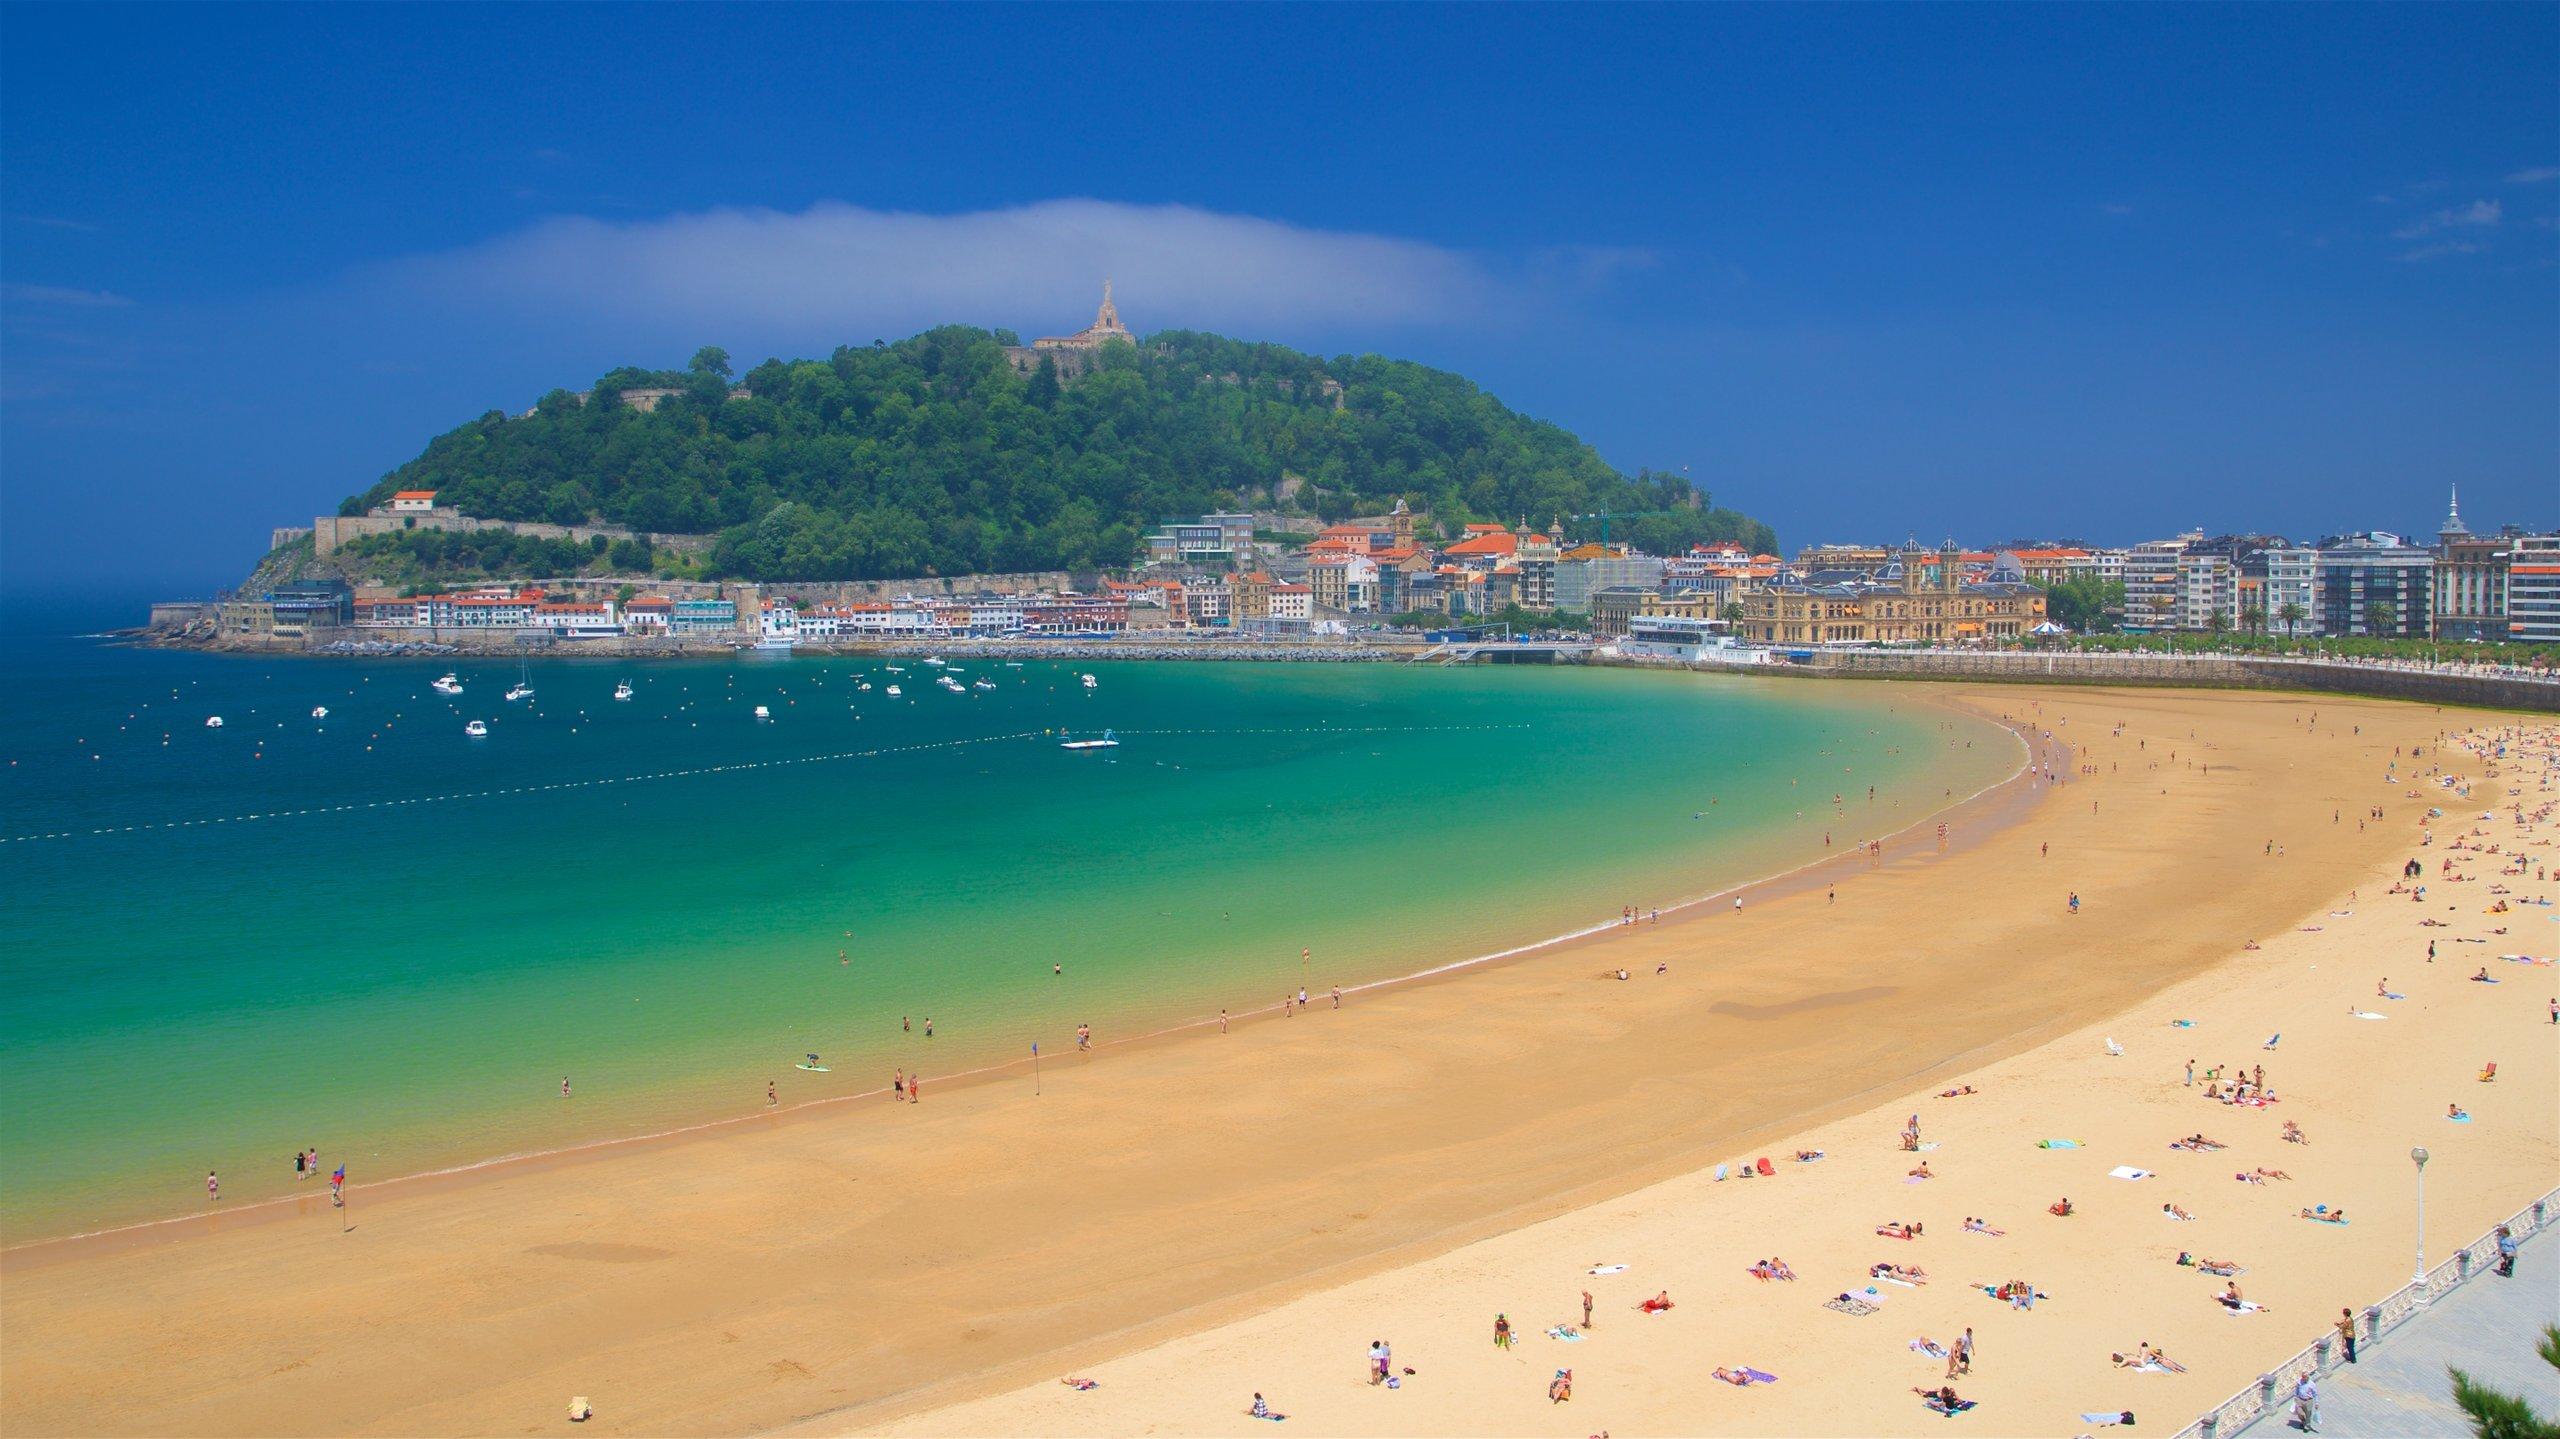 Gipuzkoa Province, Basque Country, Spain